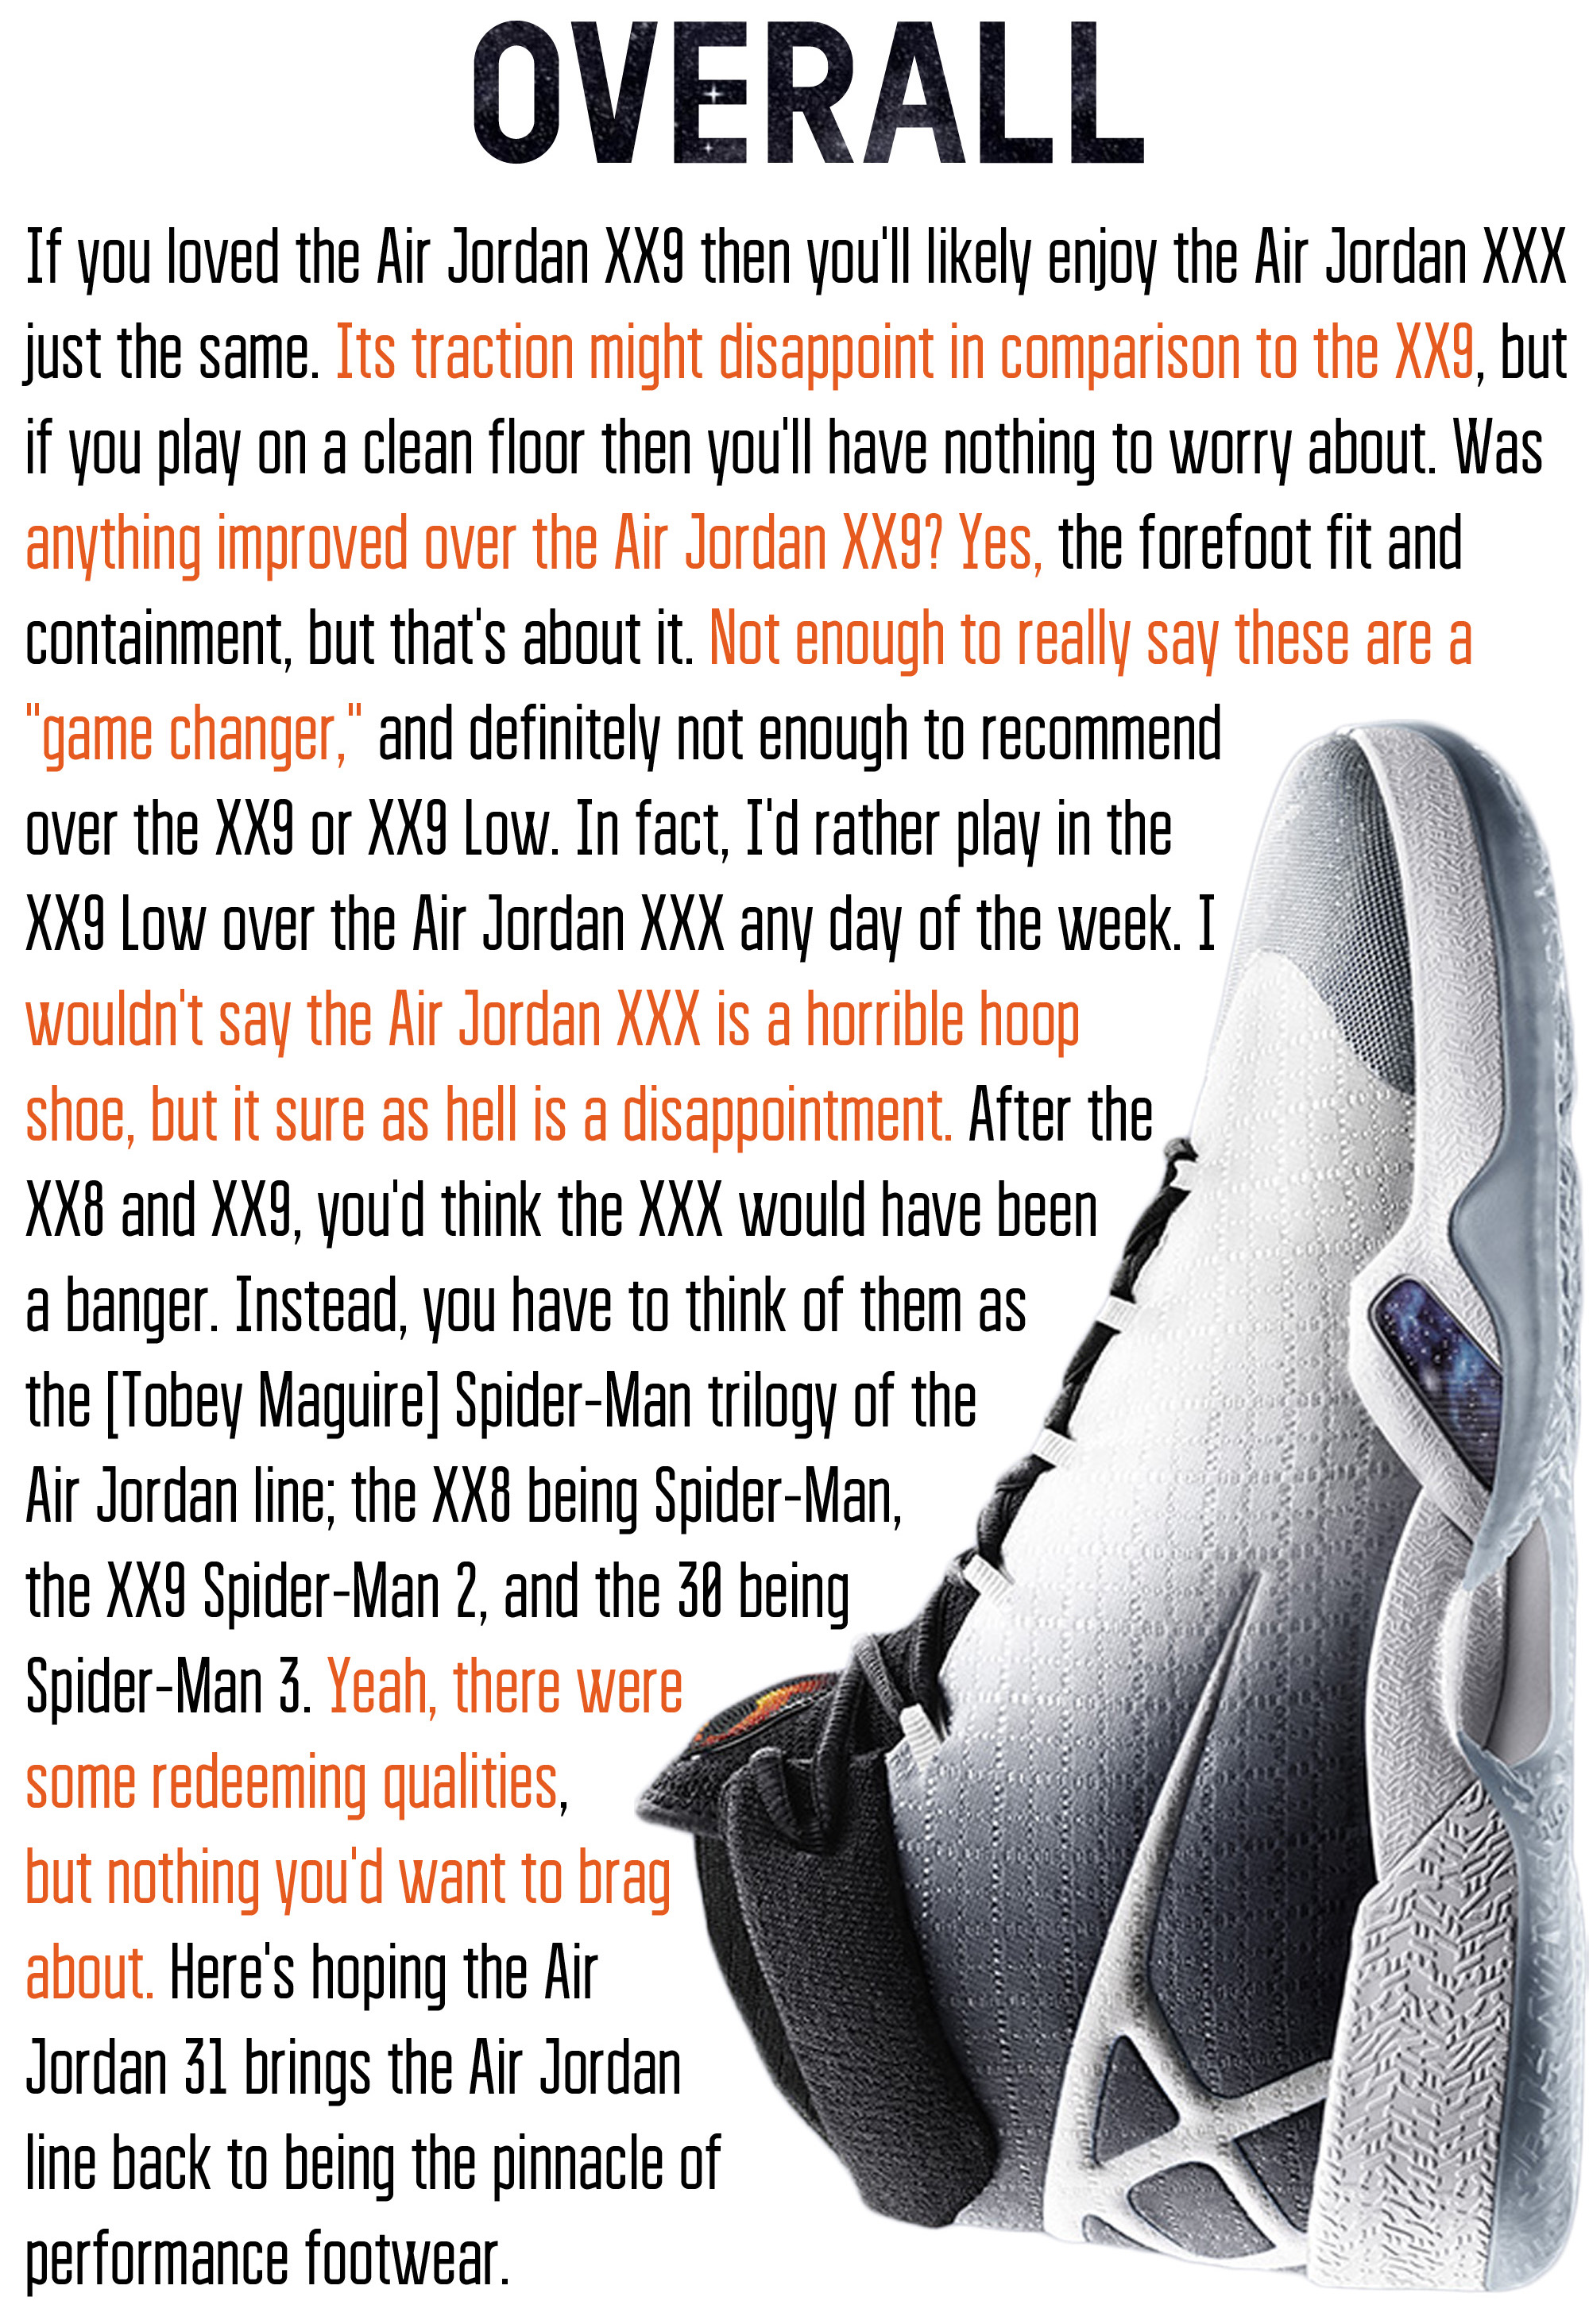 Air Jordan XXX Overall